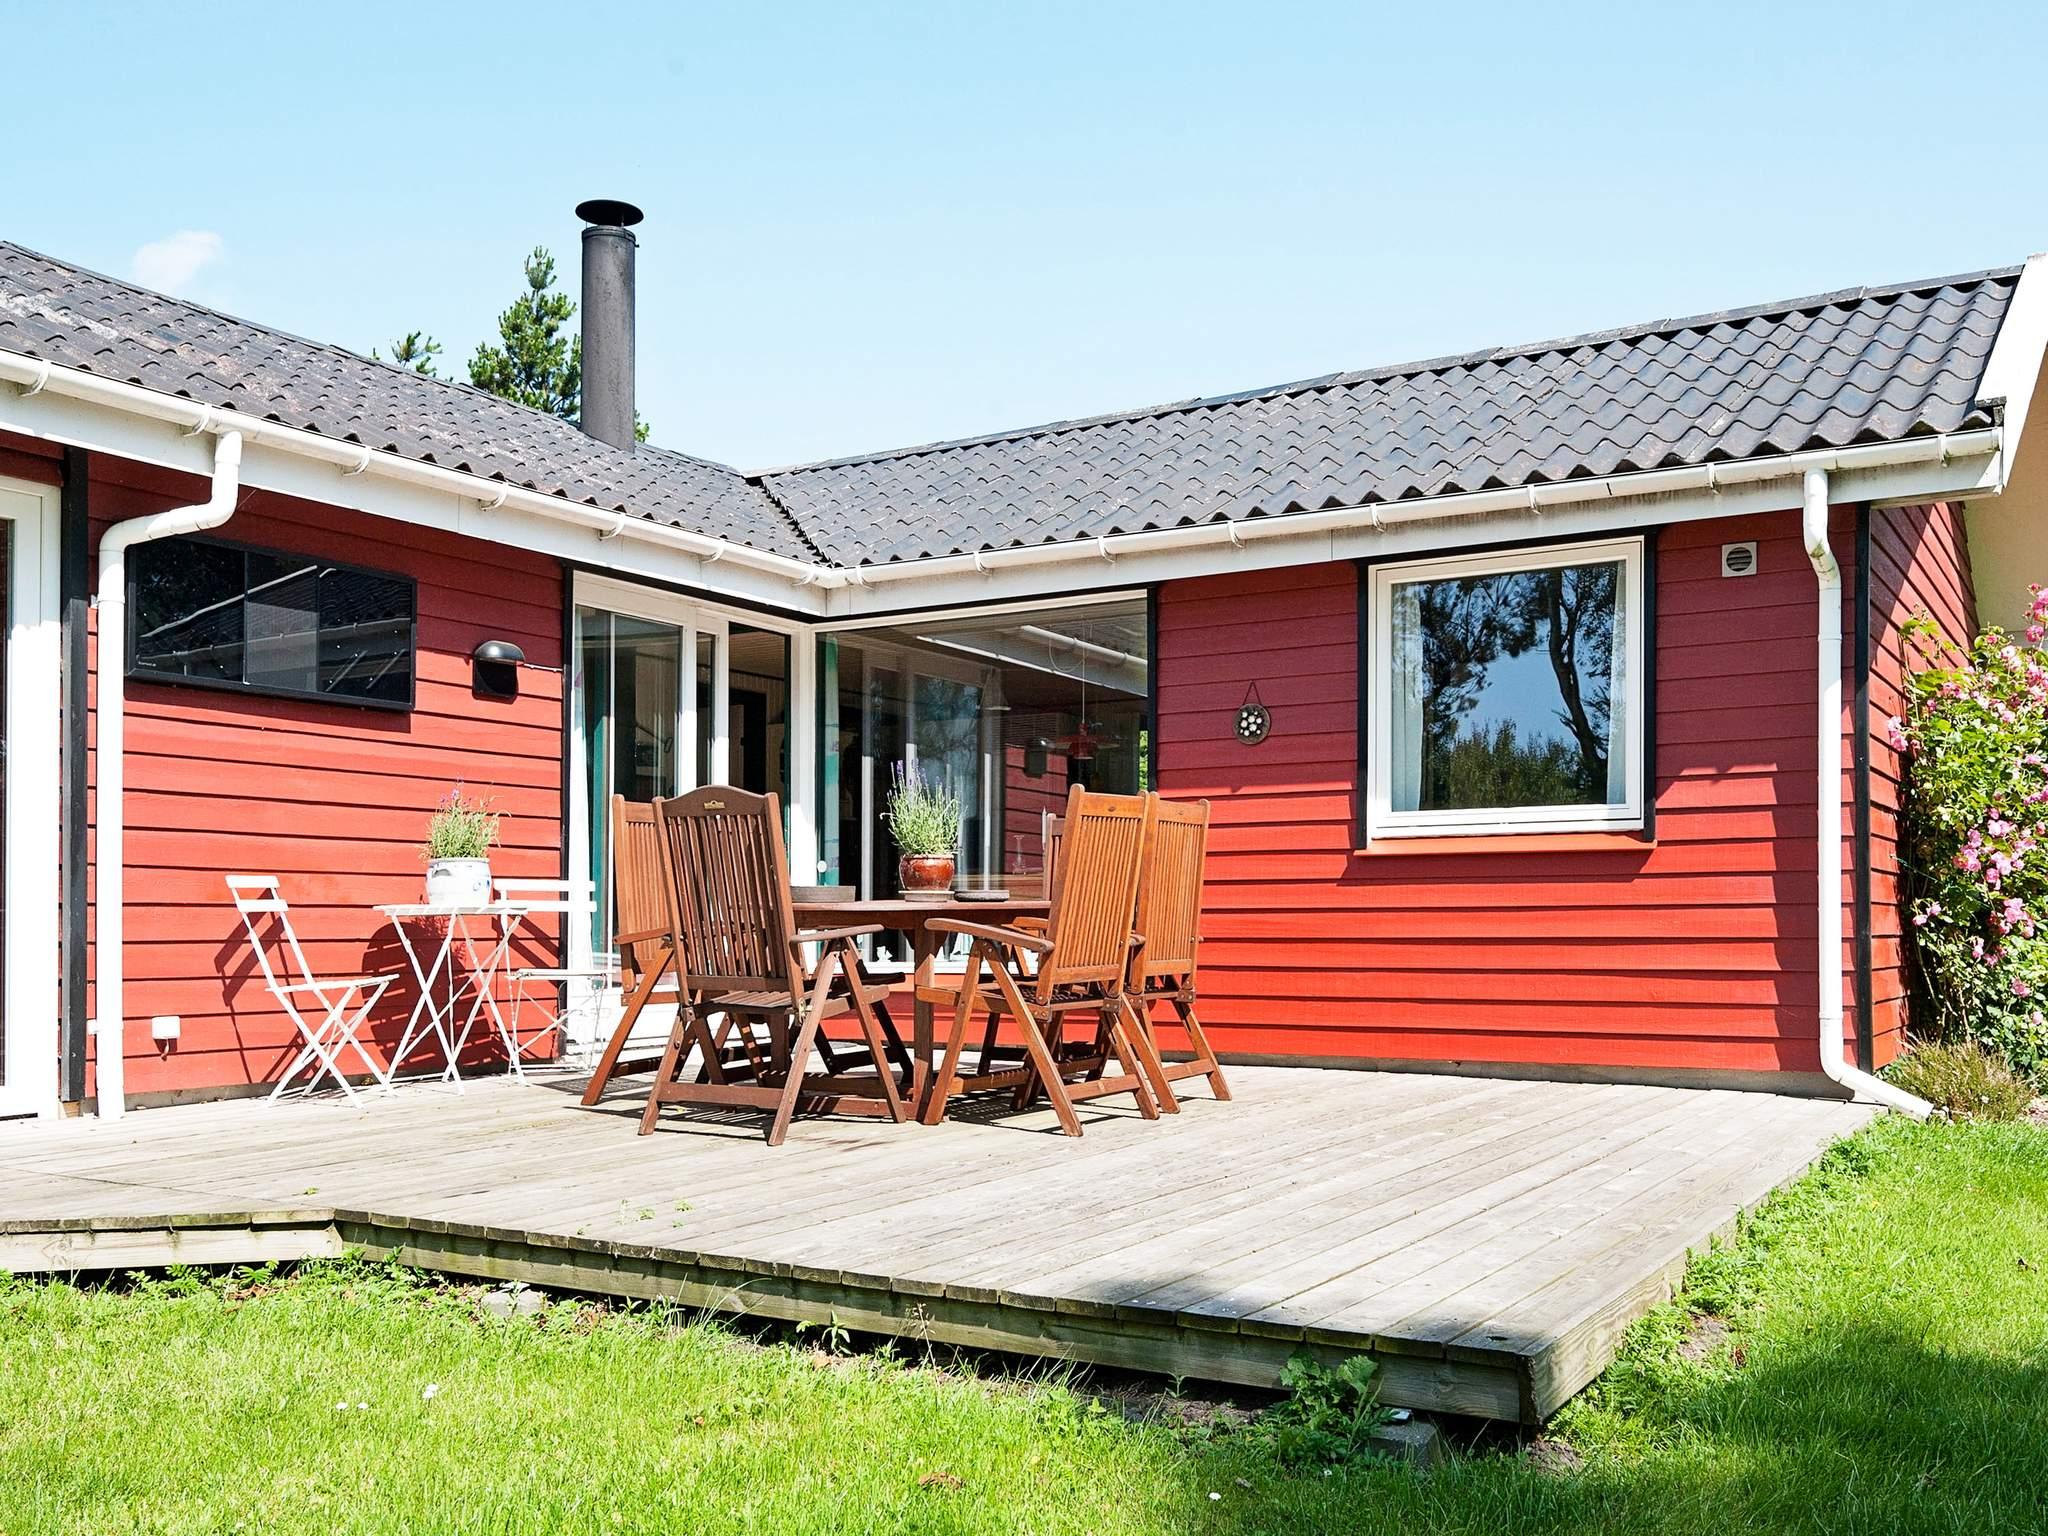 Ferienhaus Skaven Strand (493385), Tarm, , Westjütland, Dänemark, Bild 24